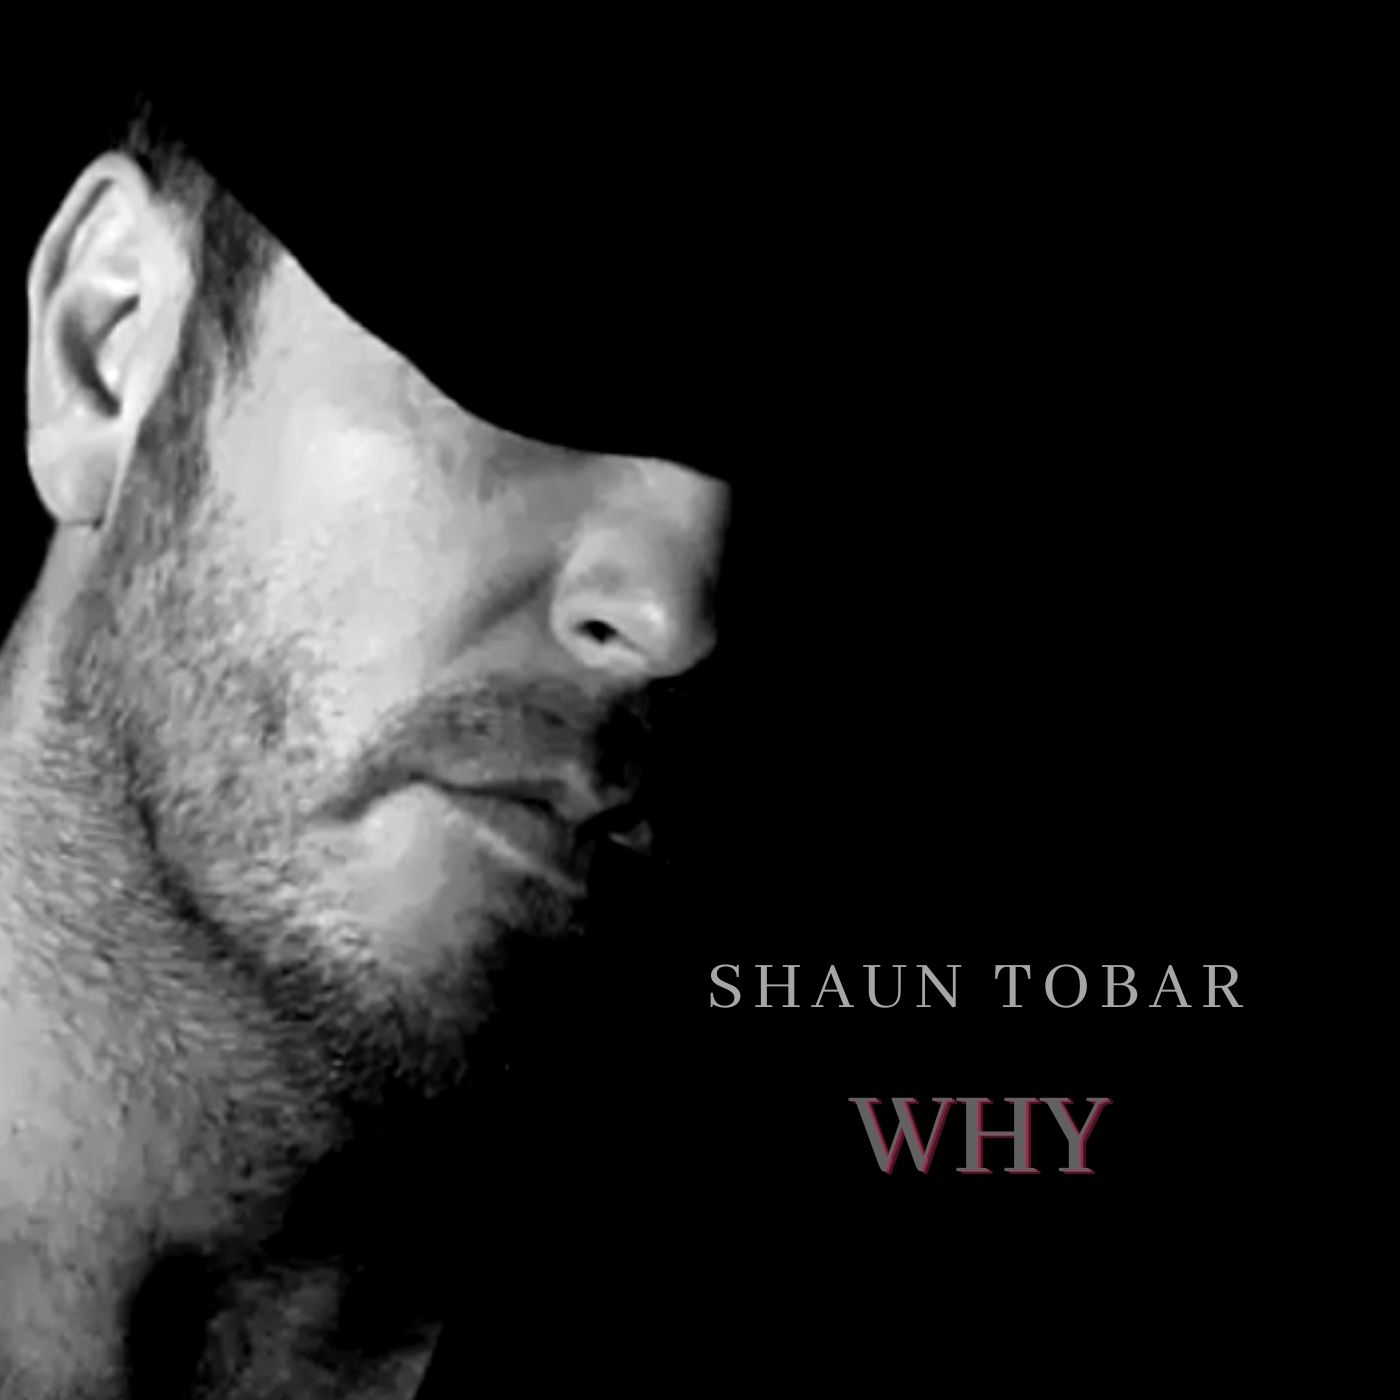 shaun tobar  latest release ''Why''